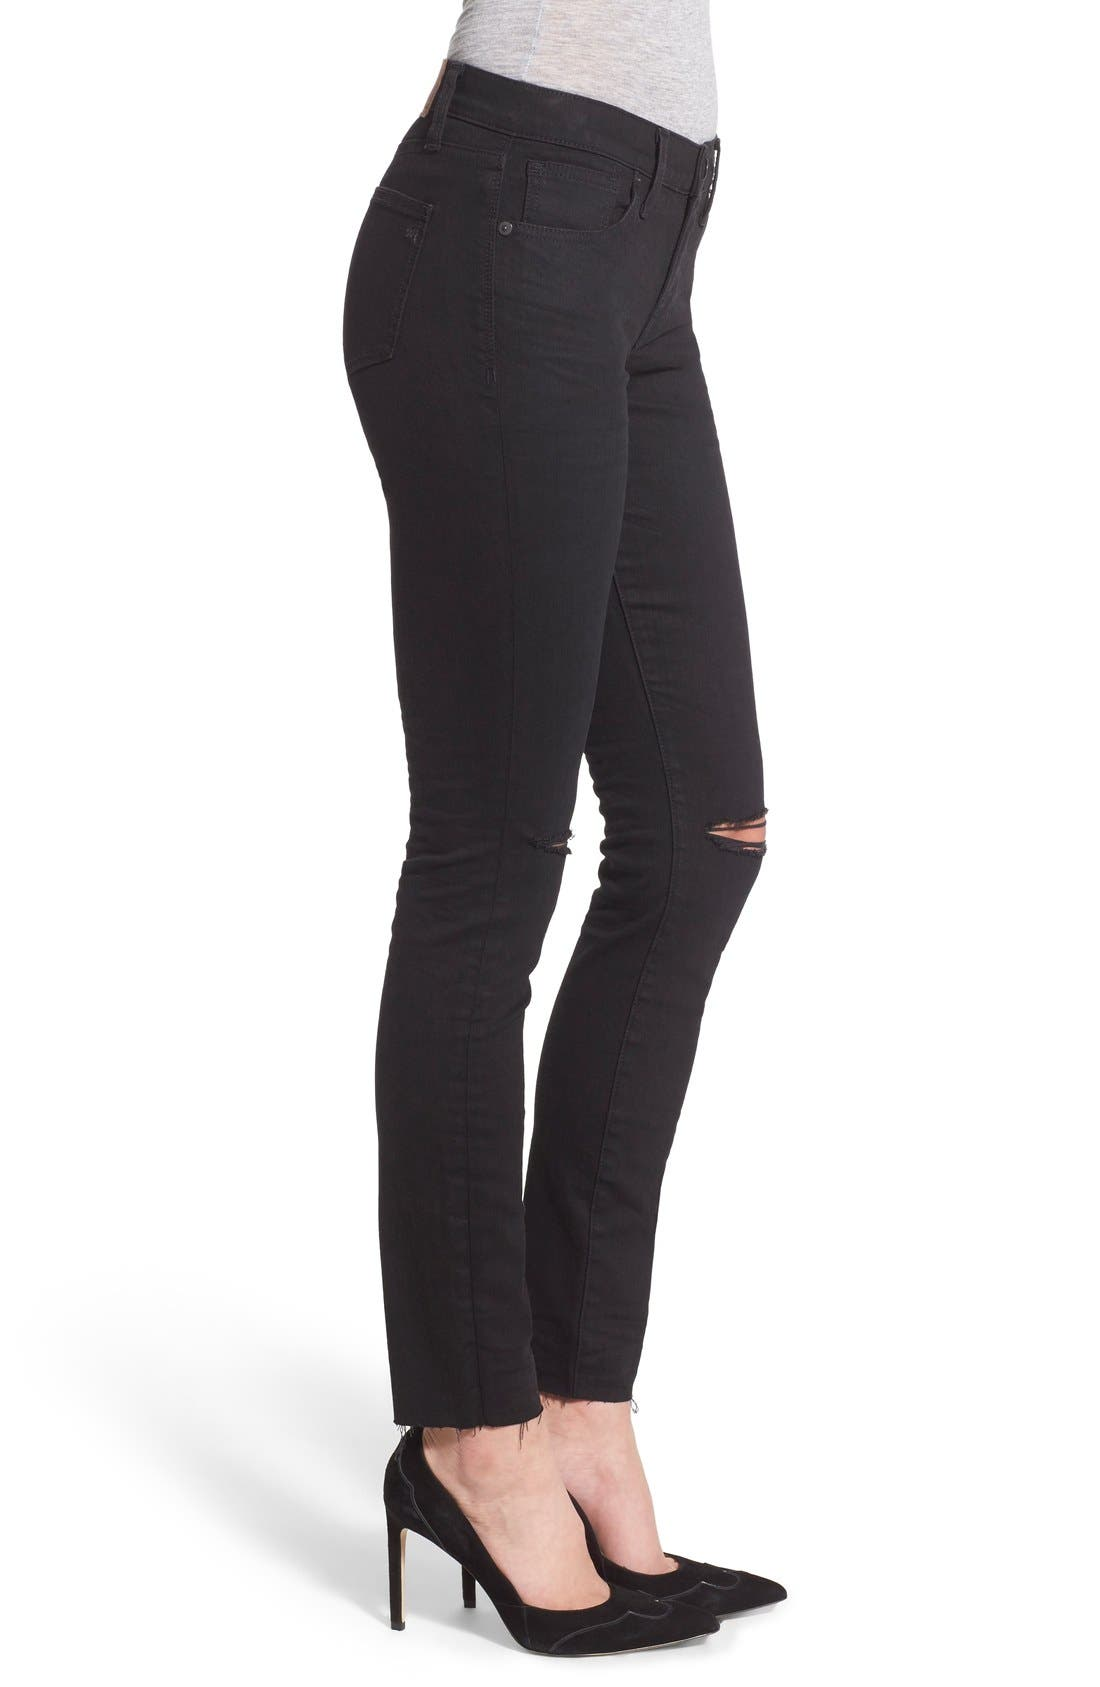 Alternate Image 3  - Madewell 'Skinny Skinny' Knee Rip Jeans (Trent Wash) (Long)